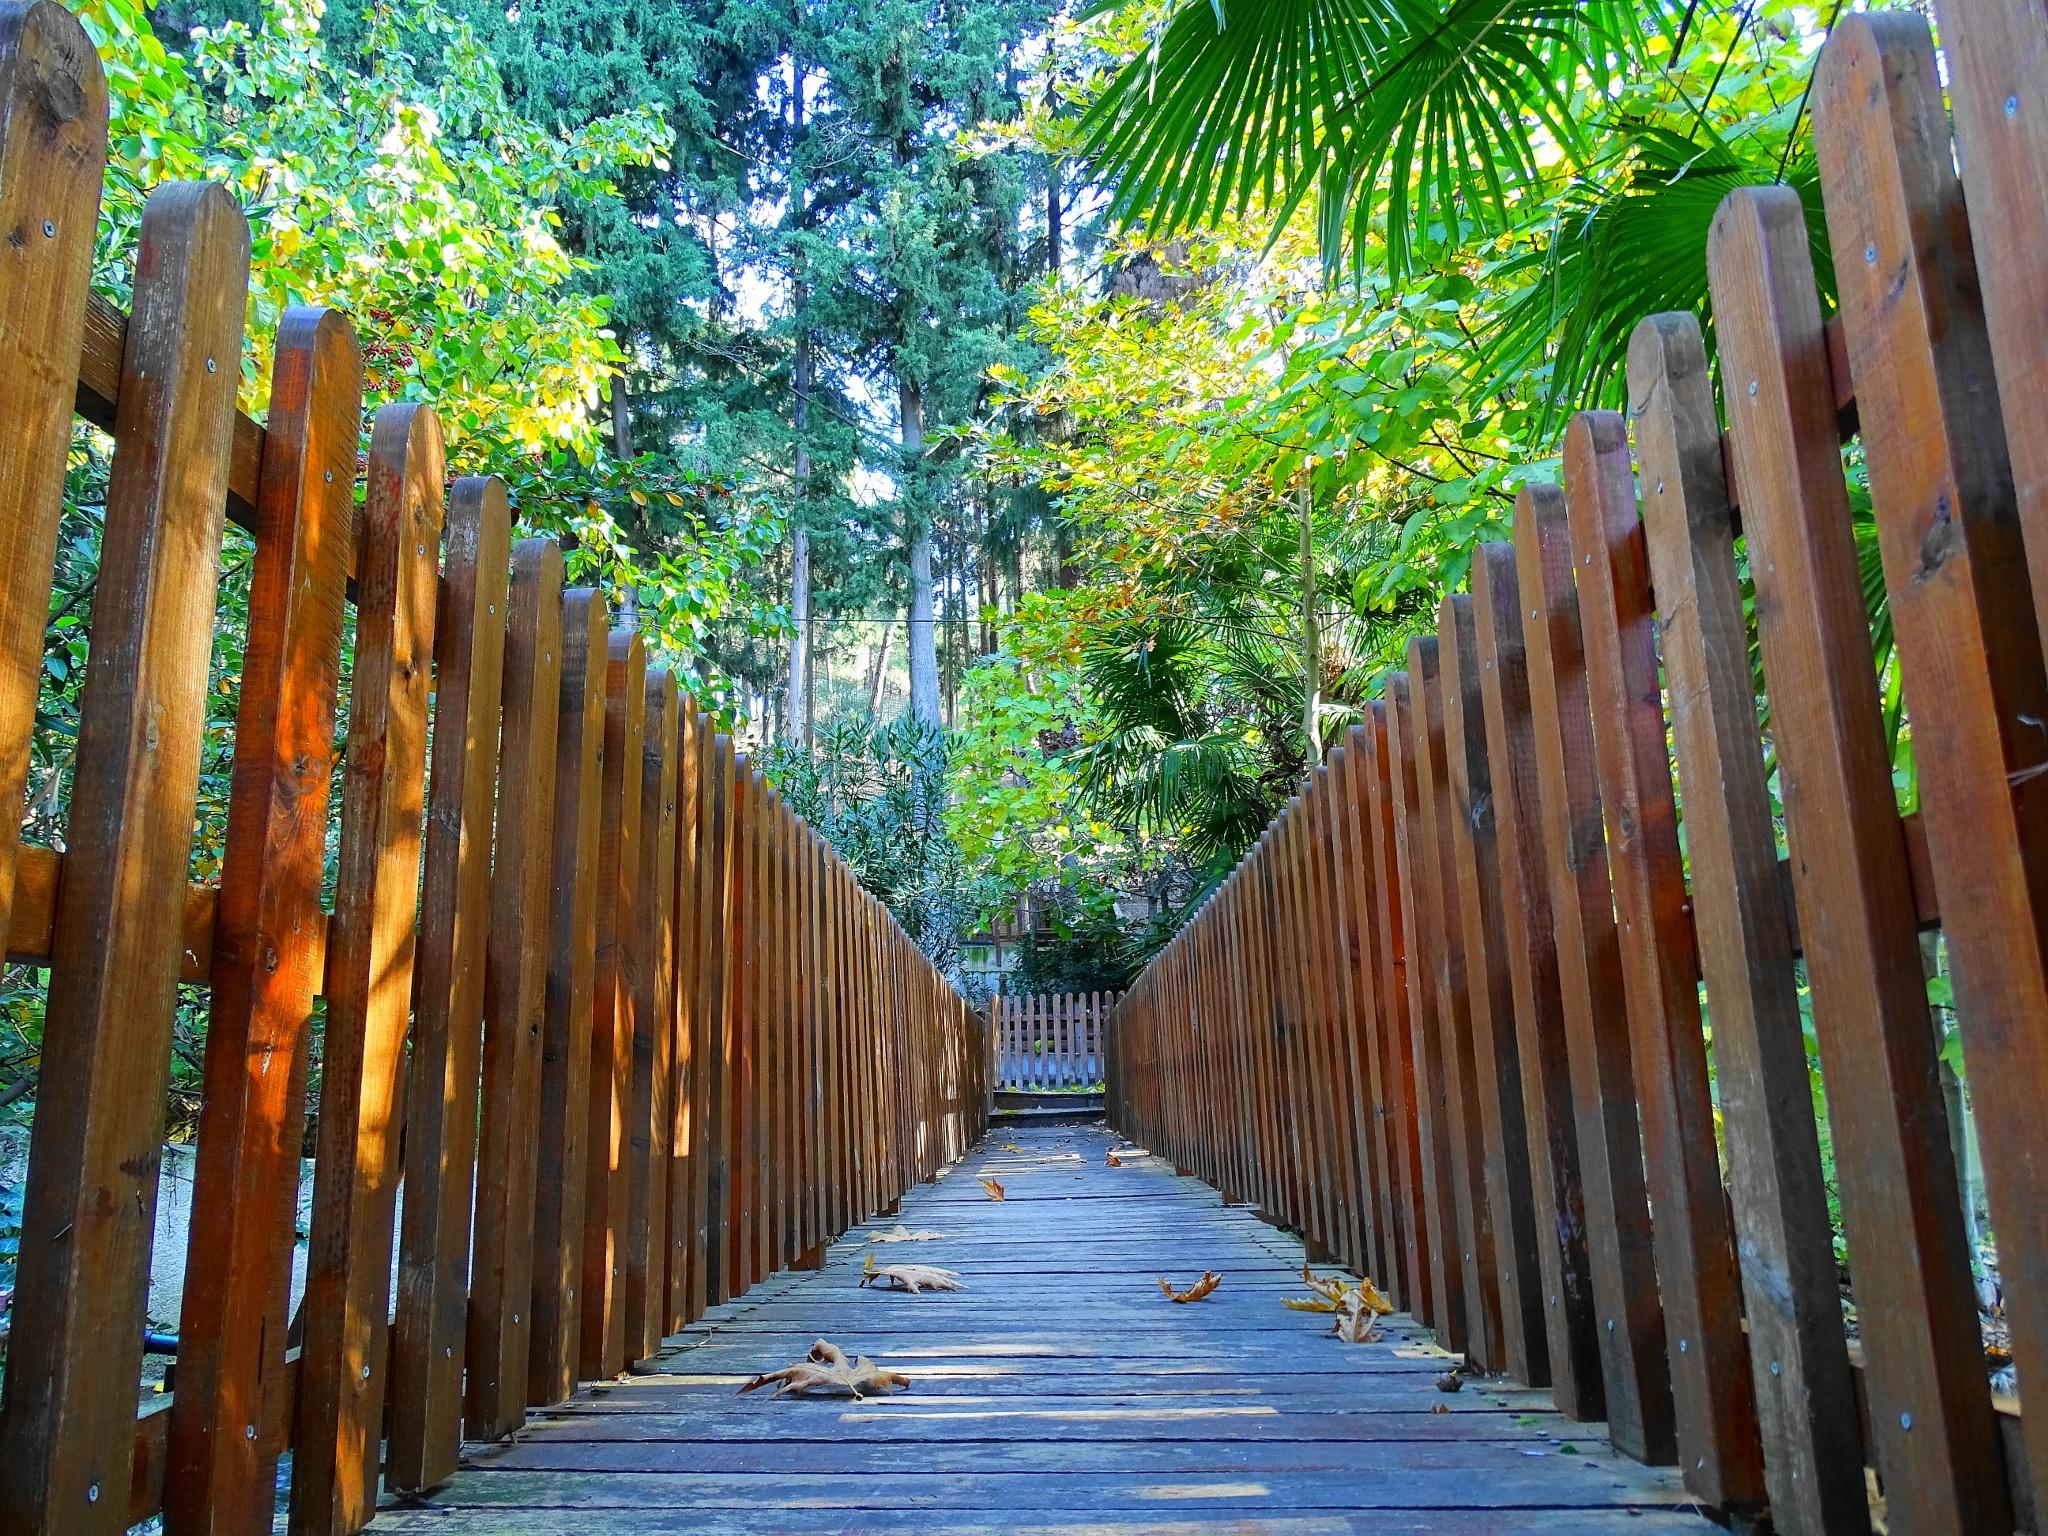 a bridge in the woods! by EL Greco